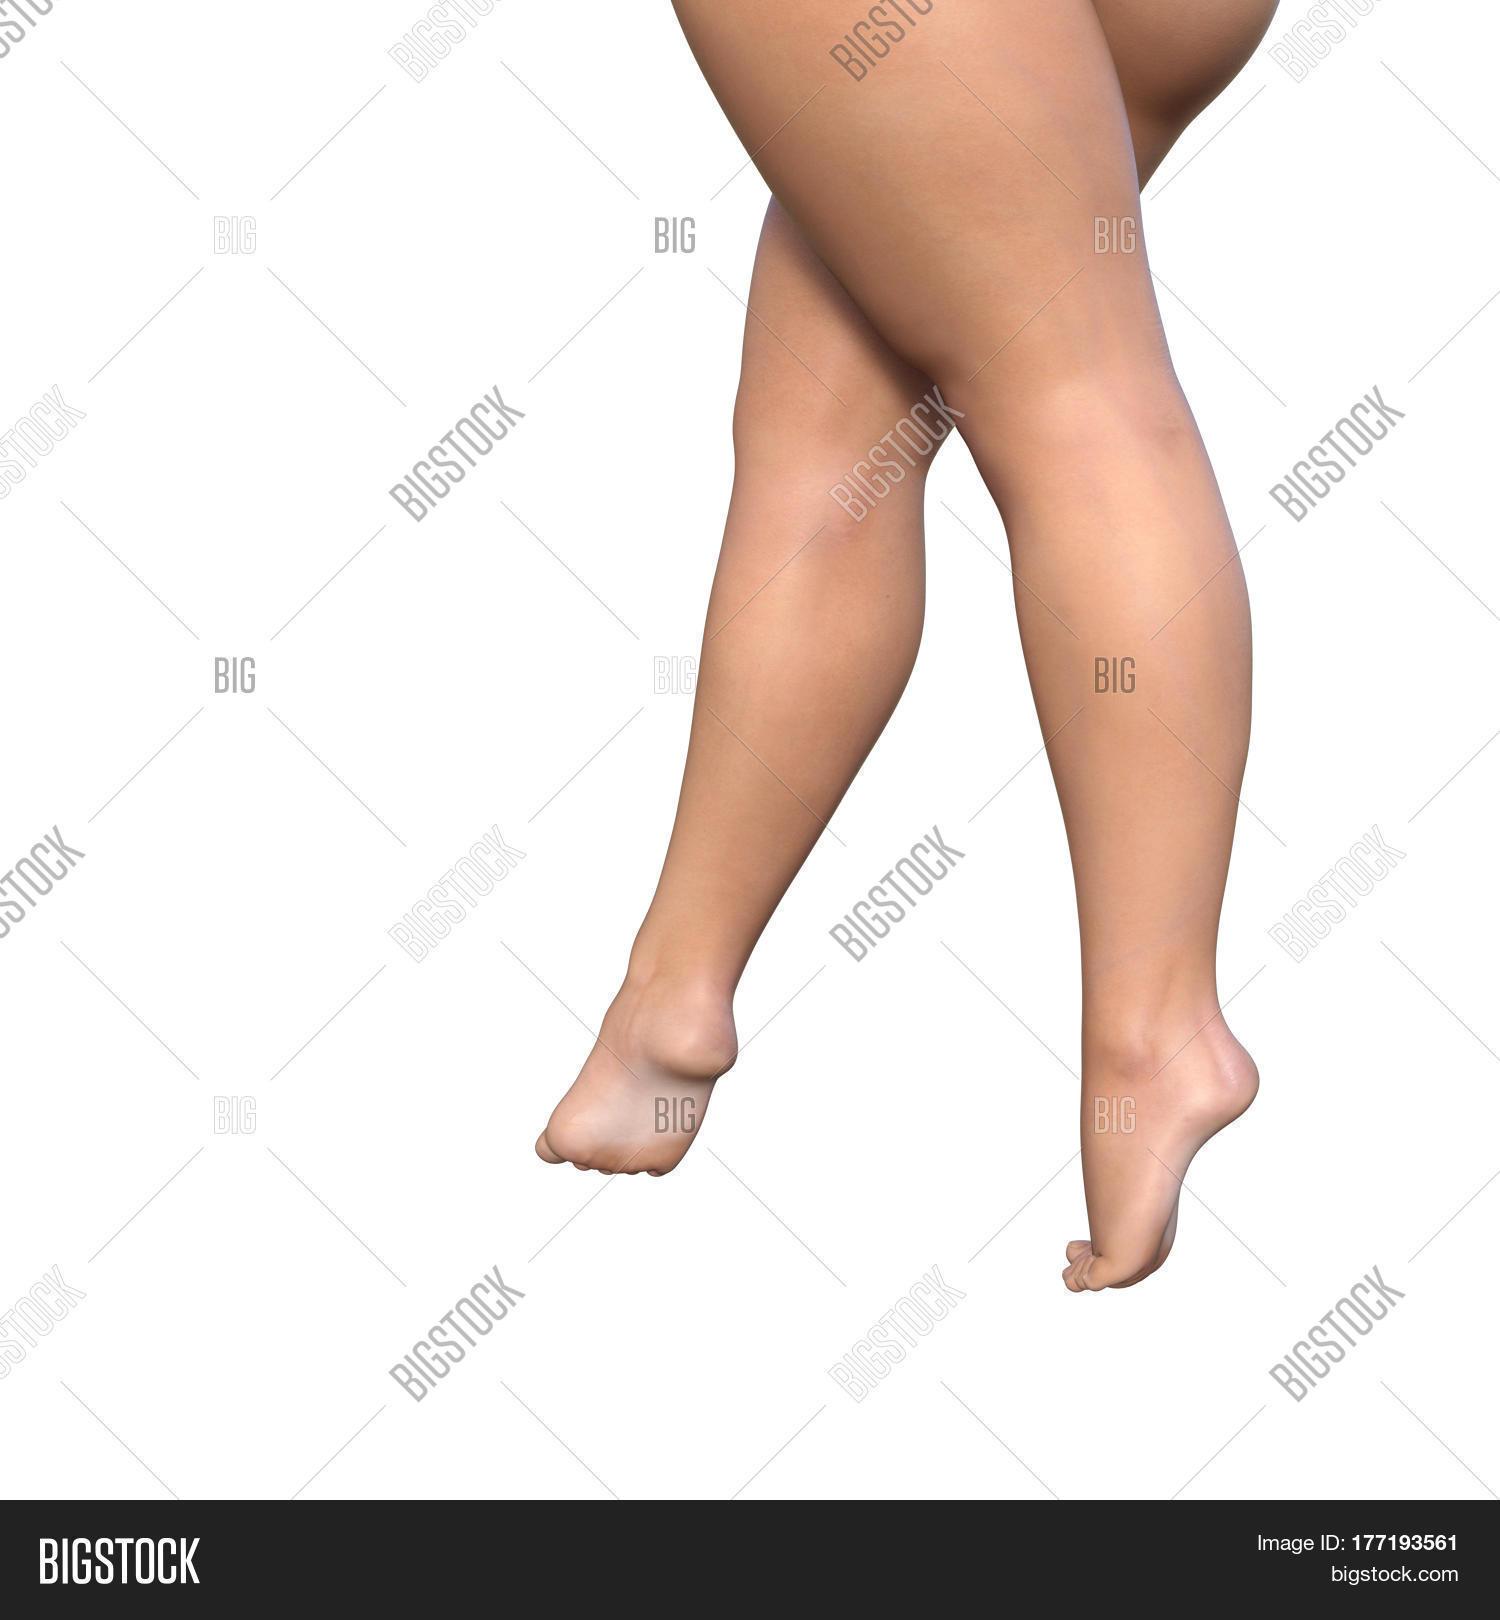 Floppy tits big nipples